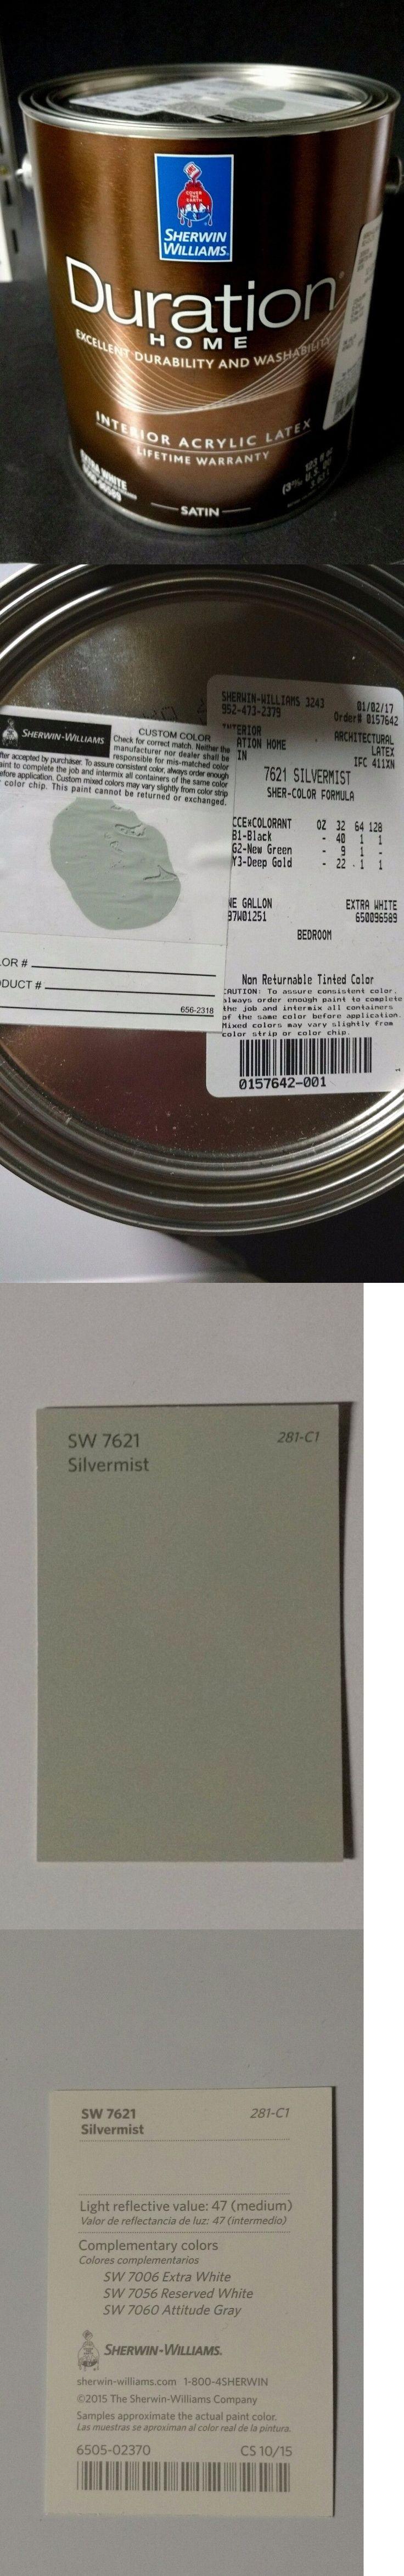 Paint 180164: Paint Latex Interior1 Gallon Acrylic 5 Sherman Williams New Satin Silvermist -> BUY IT NOW ONLY: $45.99 on eBay!